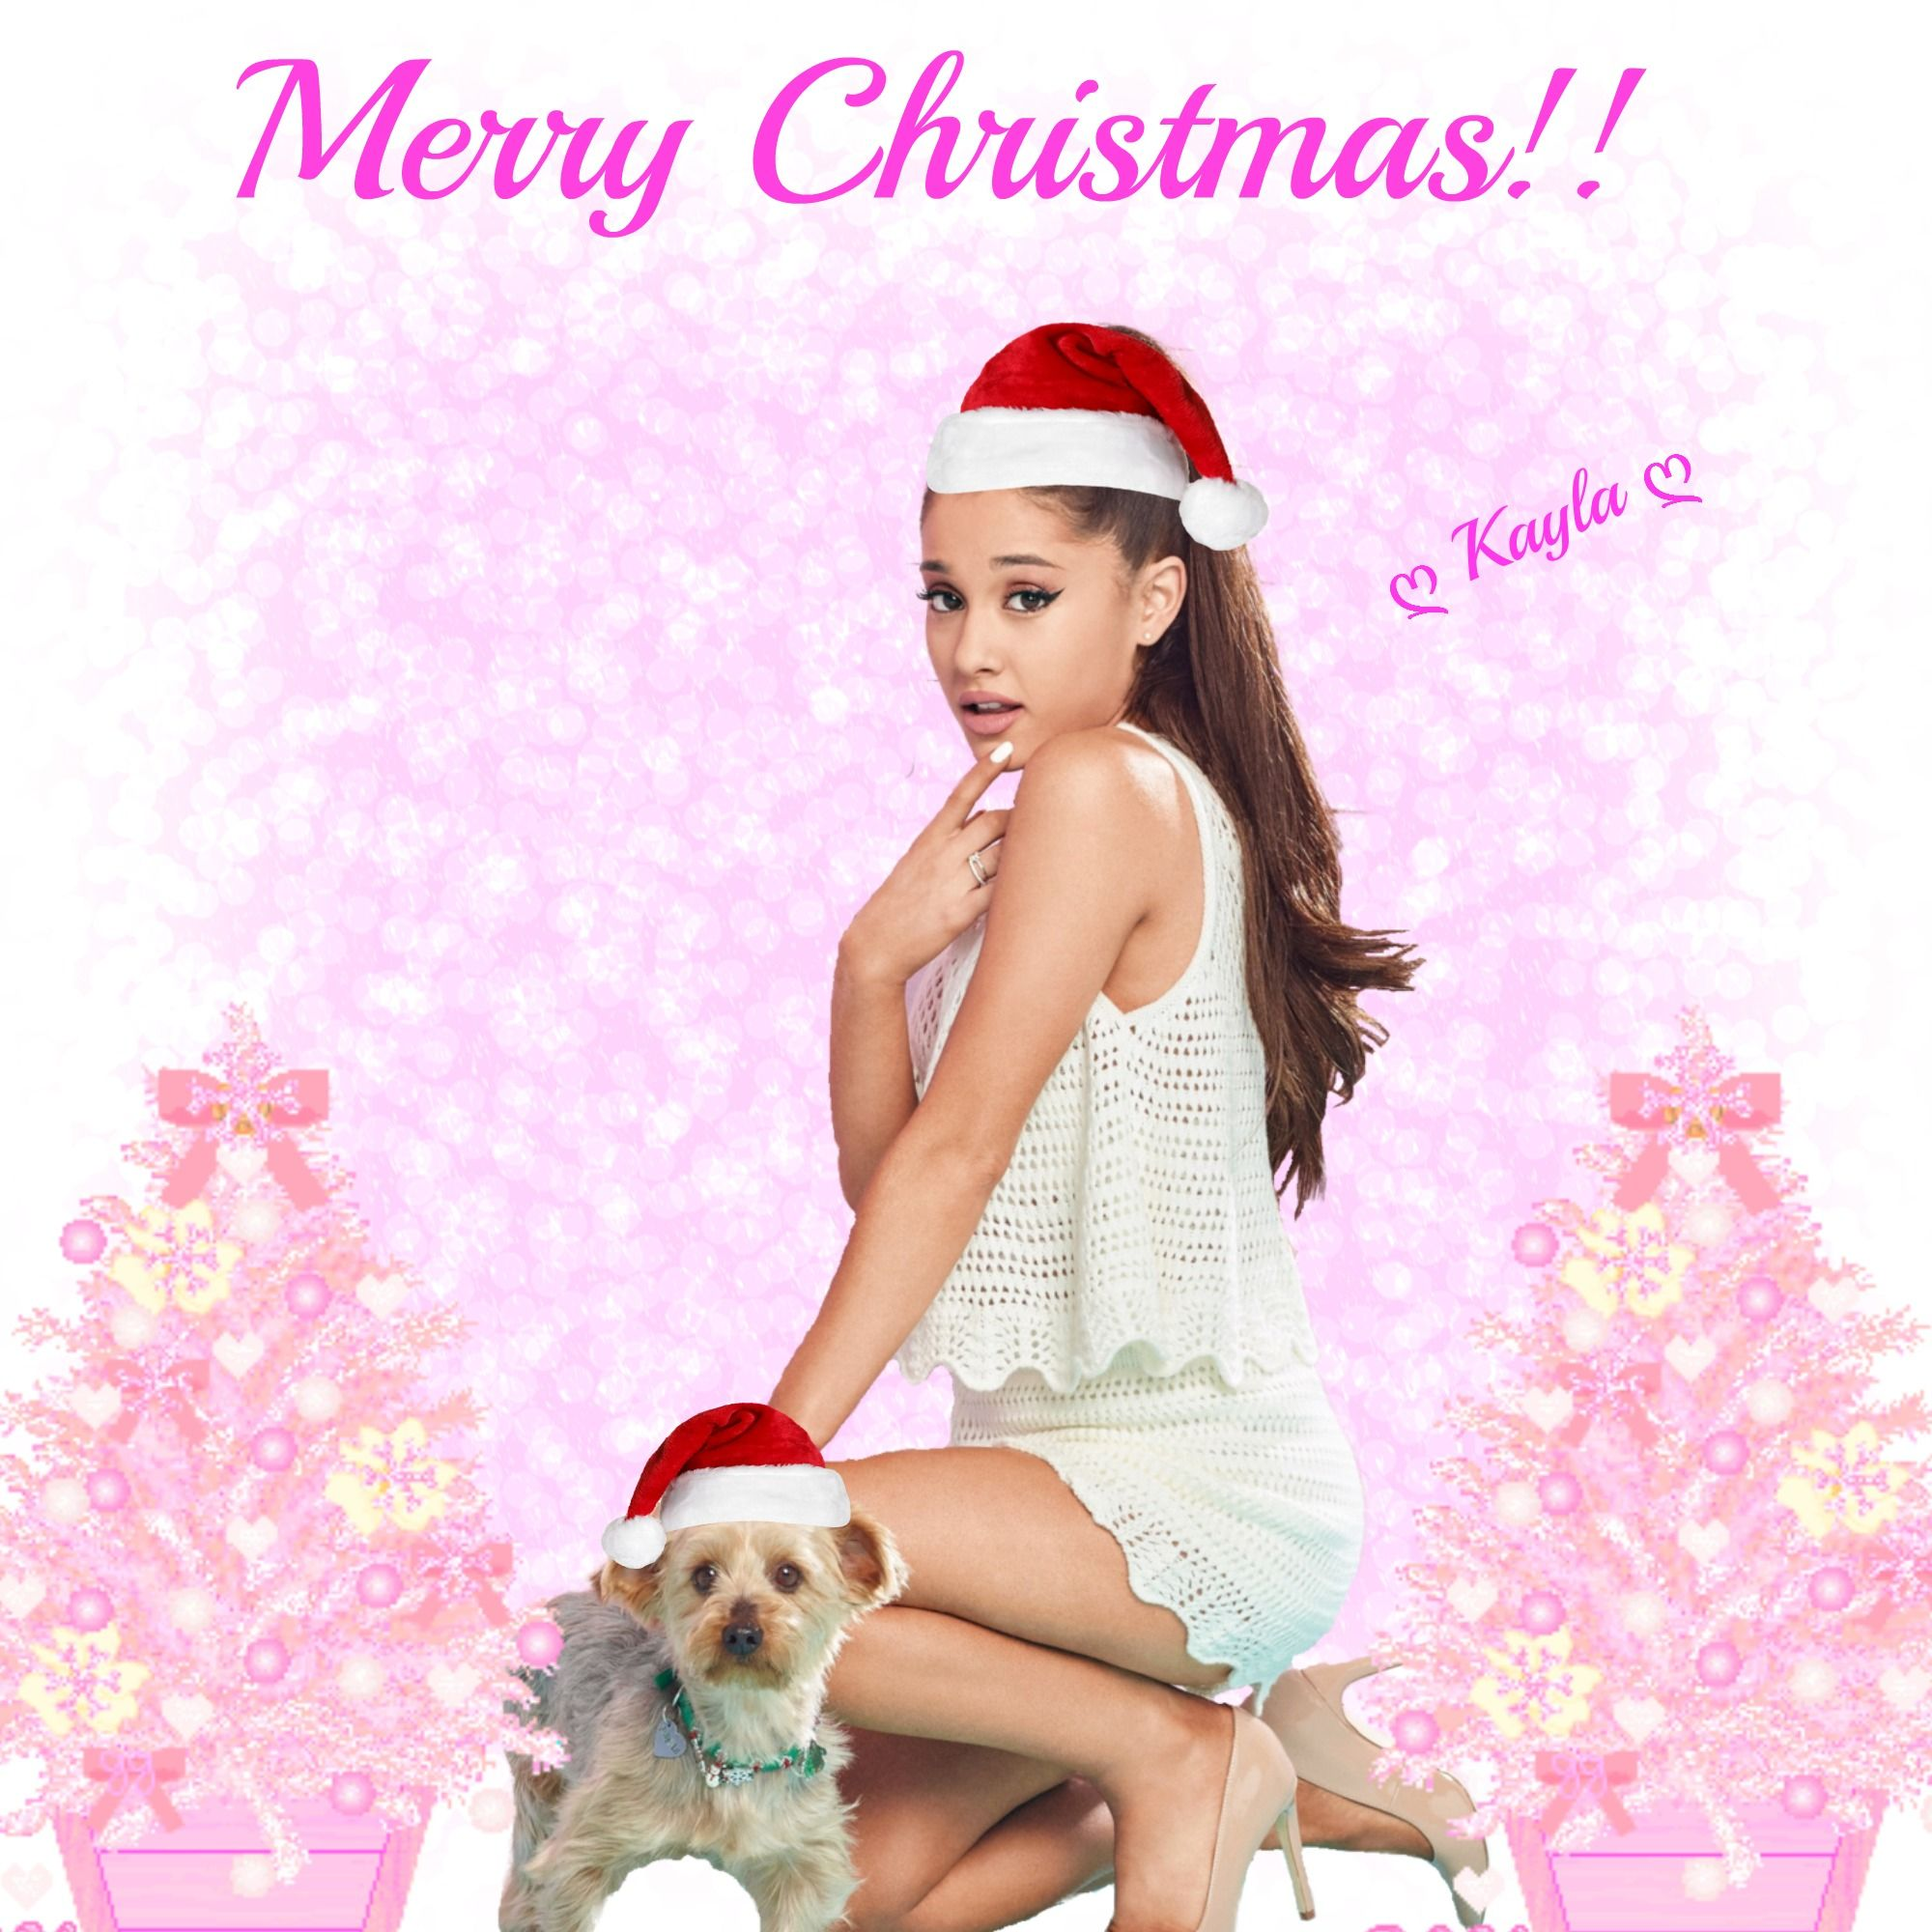 Ariana Grande Christmas Wallpaper: Merry Christmas Loves! ♡ Pinterest : ღ Kayla ღ